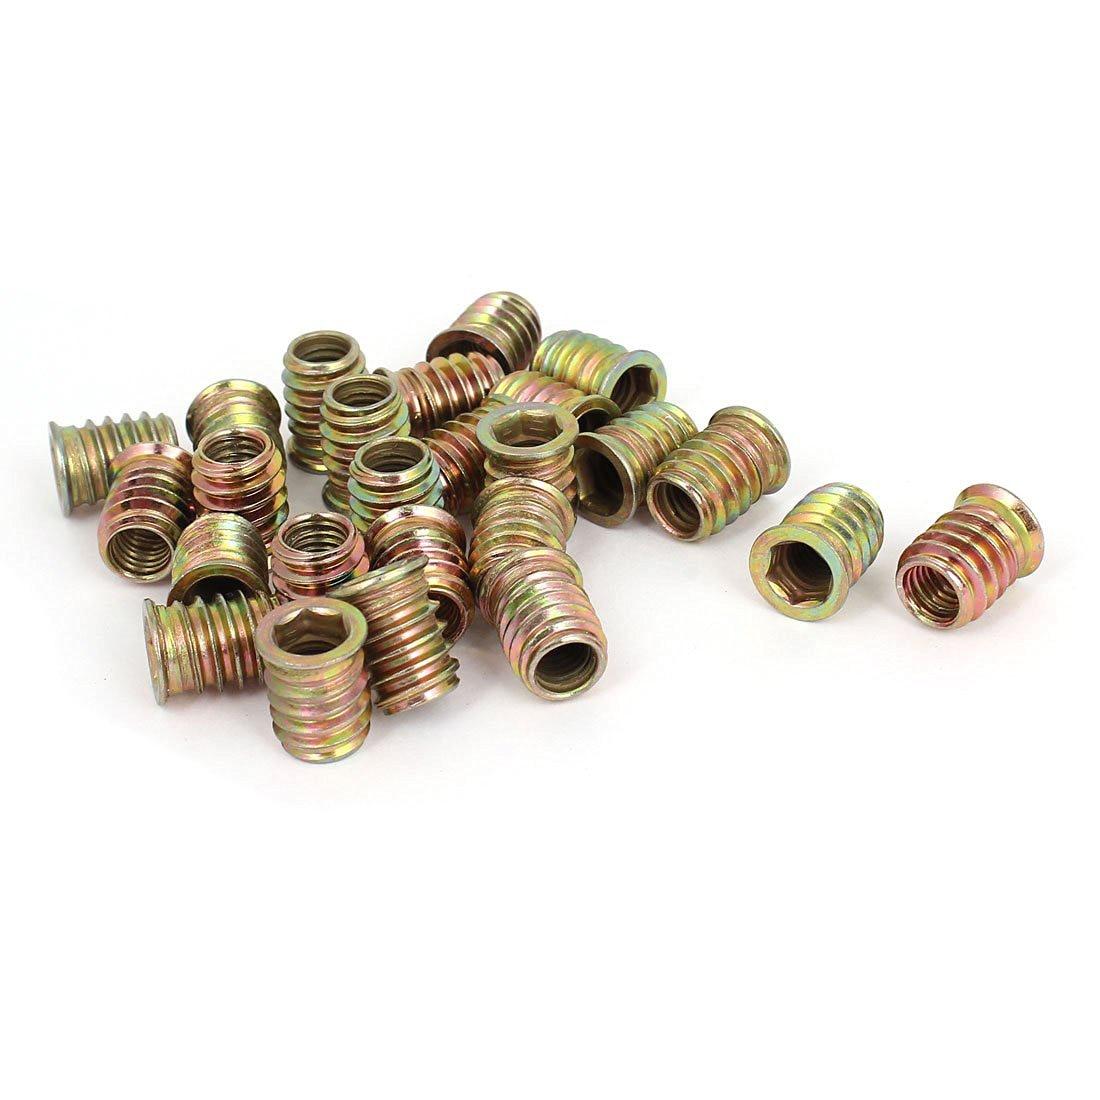 25 Pcs M8 E-Nut Wood Insert Interface Screws Hex Socket Nut Fittings, Brass Tone 25 pcs m8 e nut wood insert interface screws hex socket nut fittings brass tone